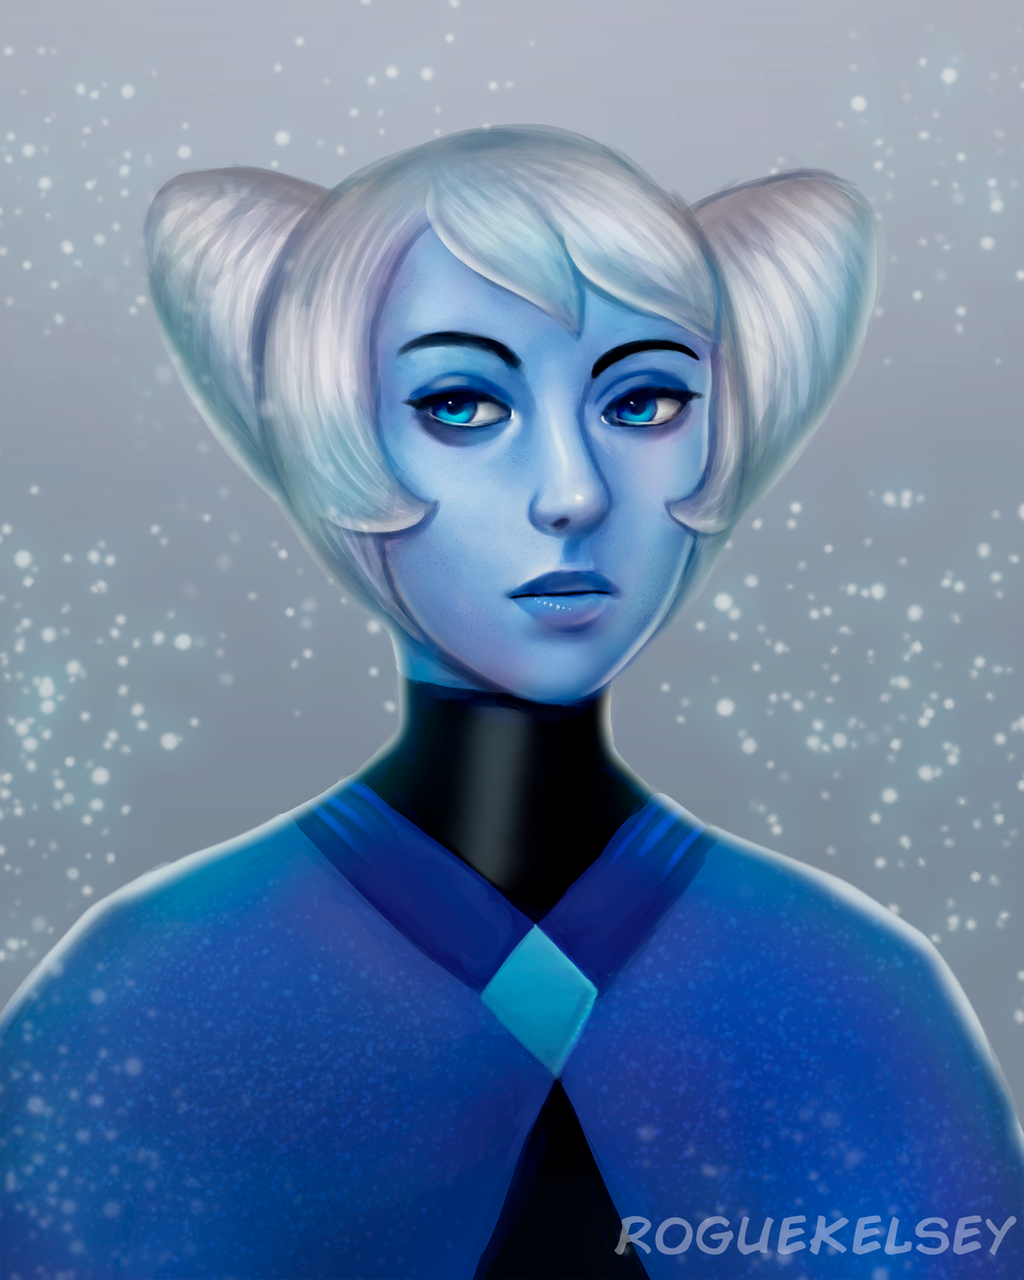 Holly Blue Agate (Speedpaint) by ROGUEKELSEY